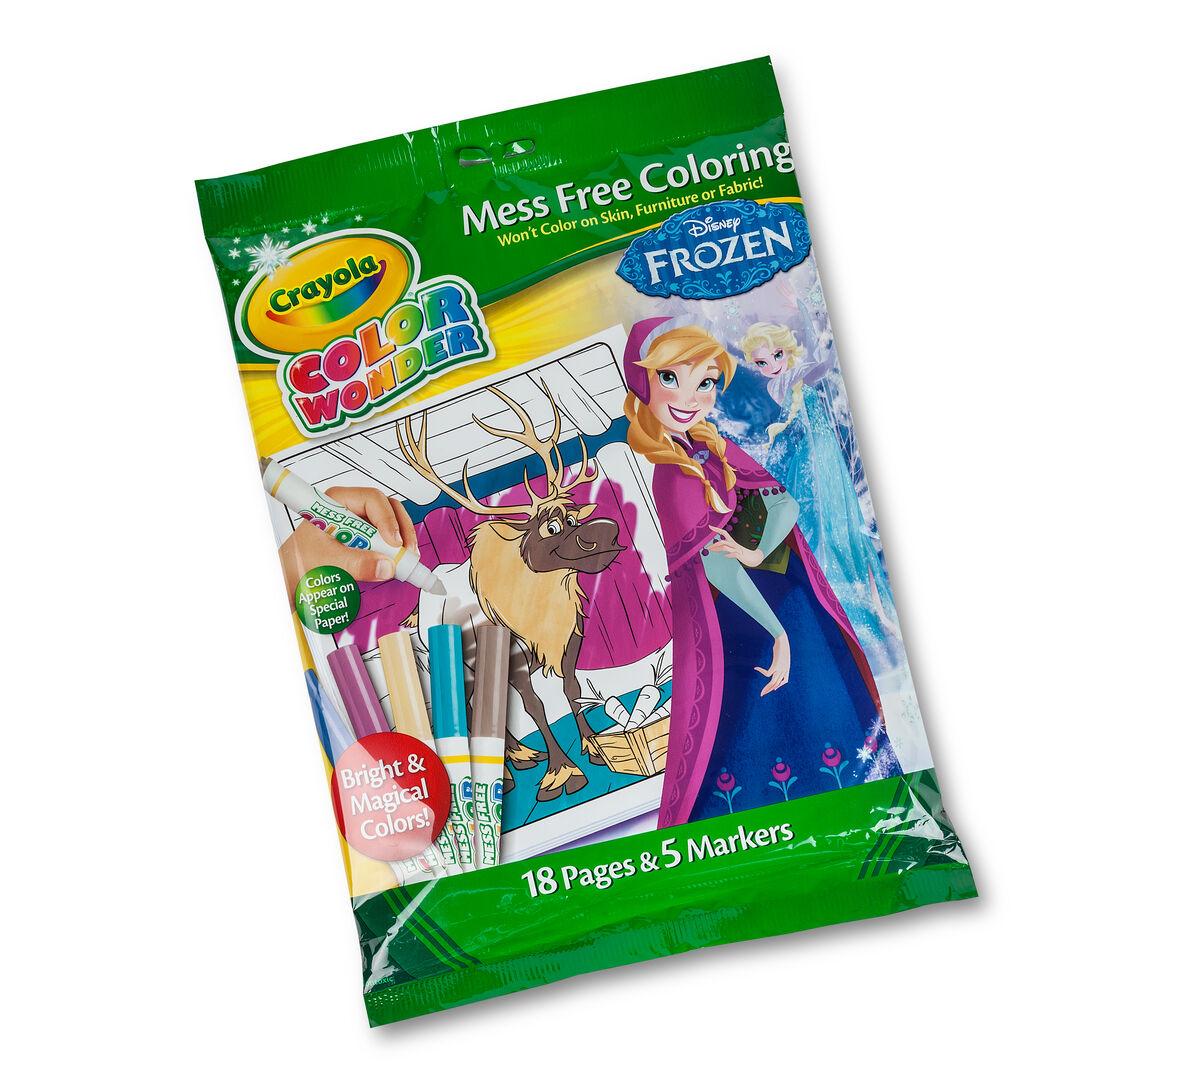 Crayola Color Wonder Mess Free Coloring